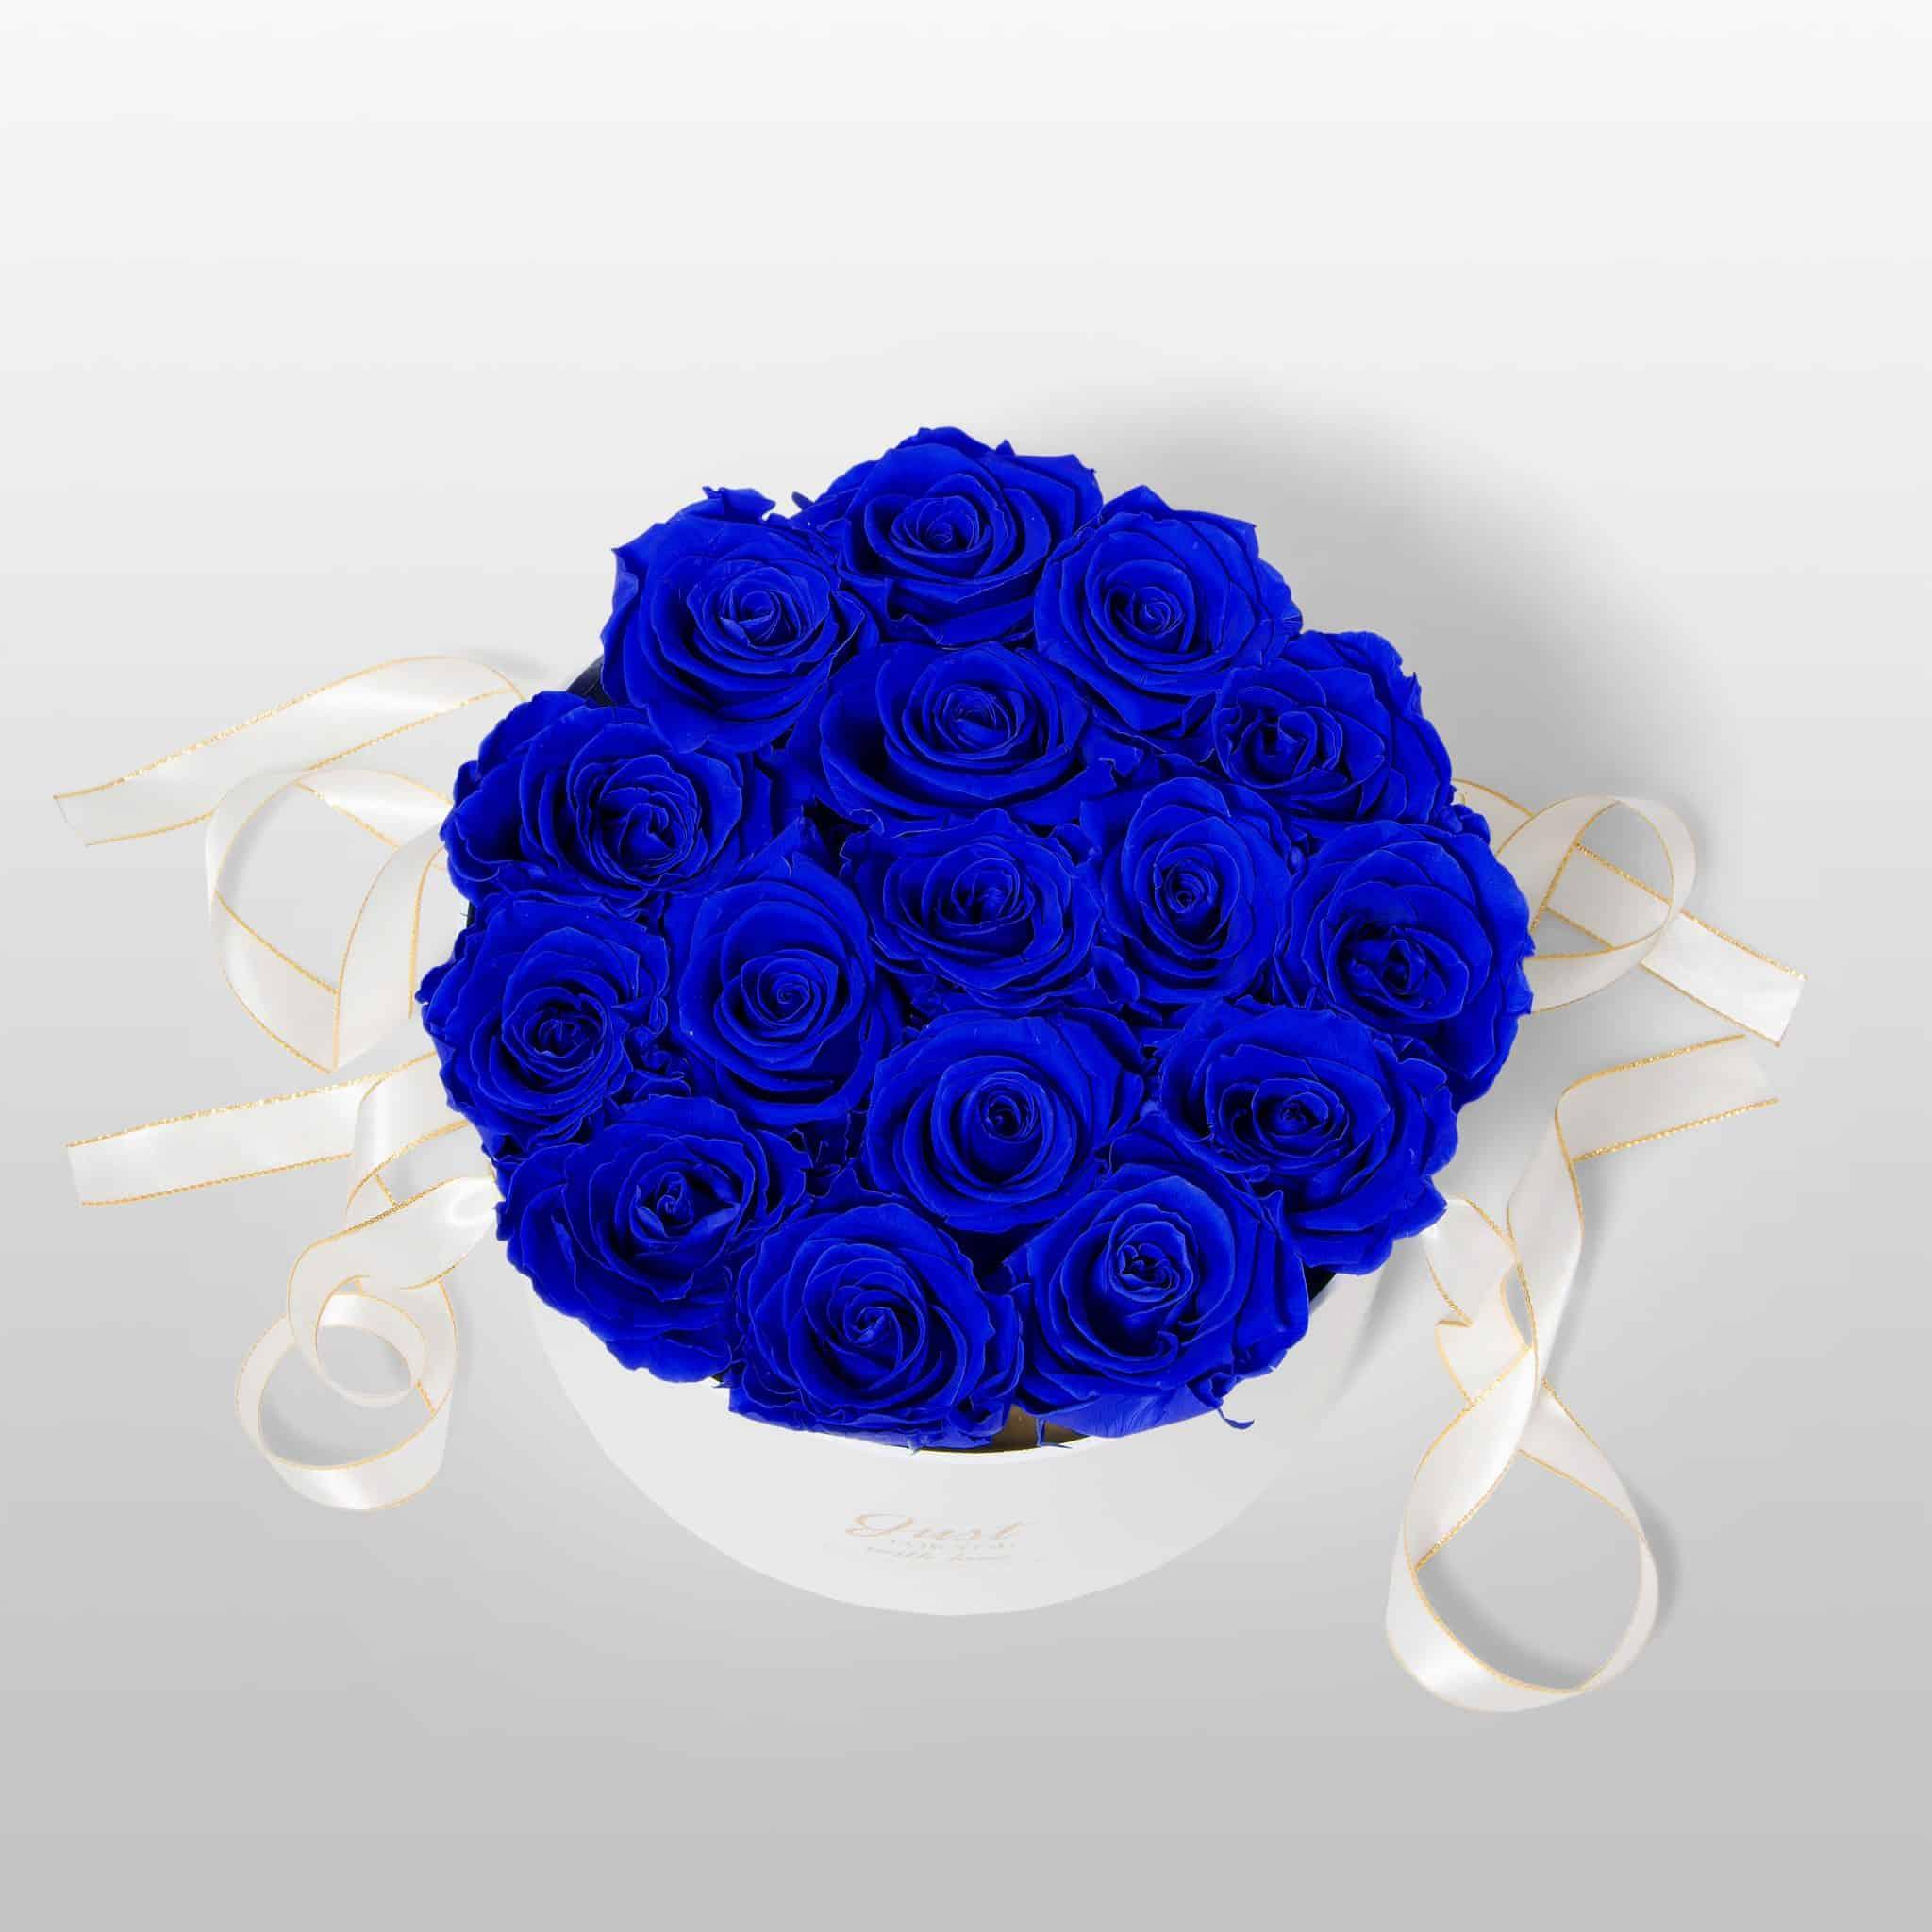 Rose Blu Stabilizzate Just For You Piccolo